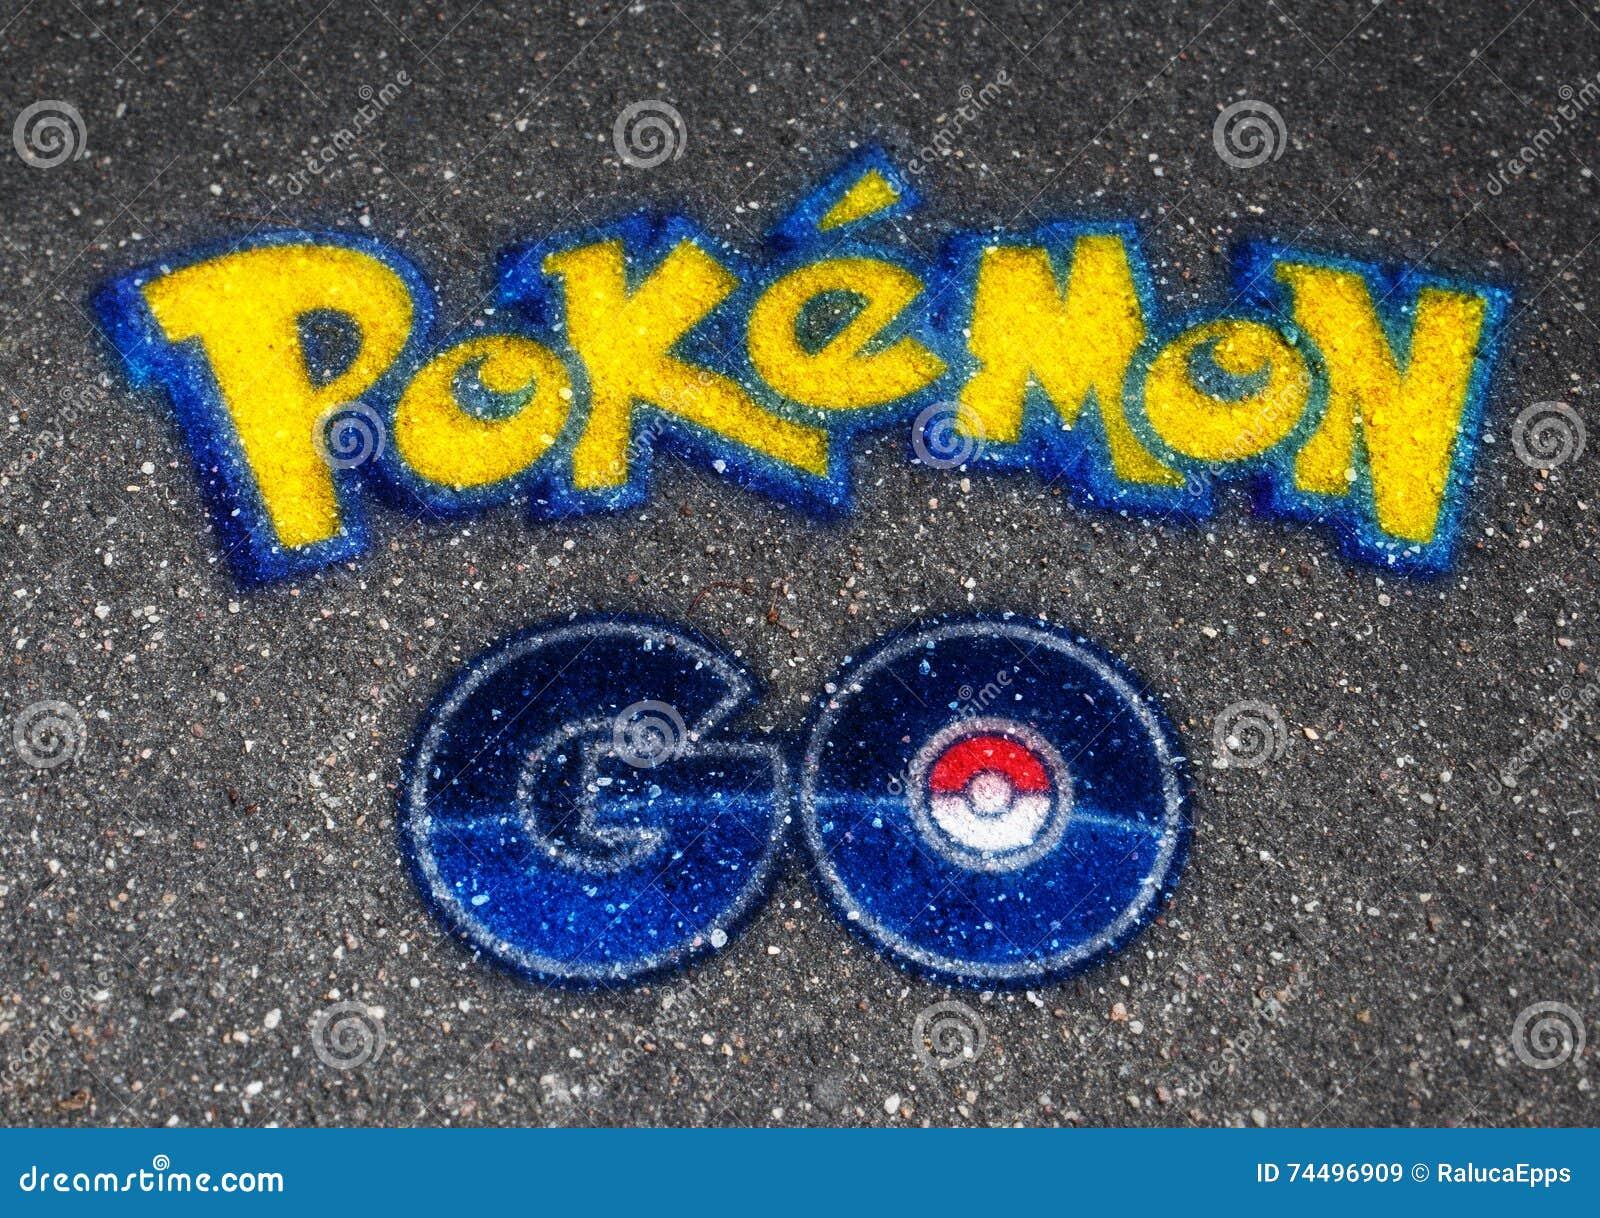 Editorial Stock Image Pokemon Go Logo Ball Drawn Asphalt Most Famous S